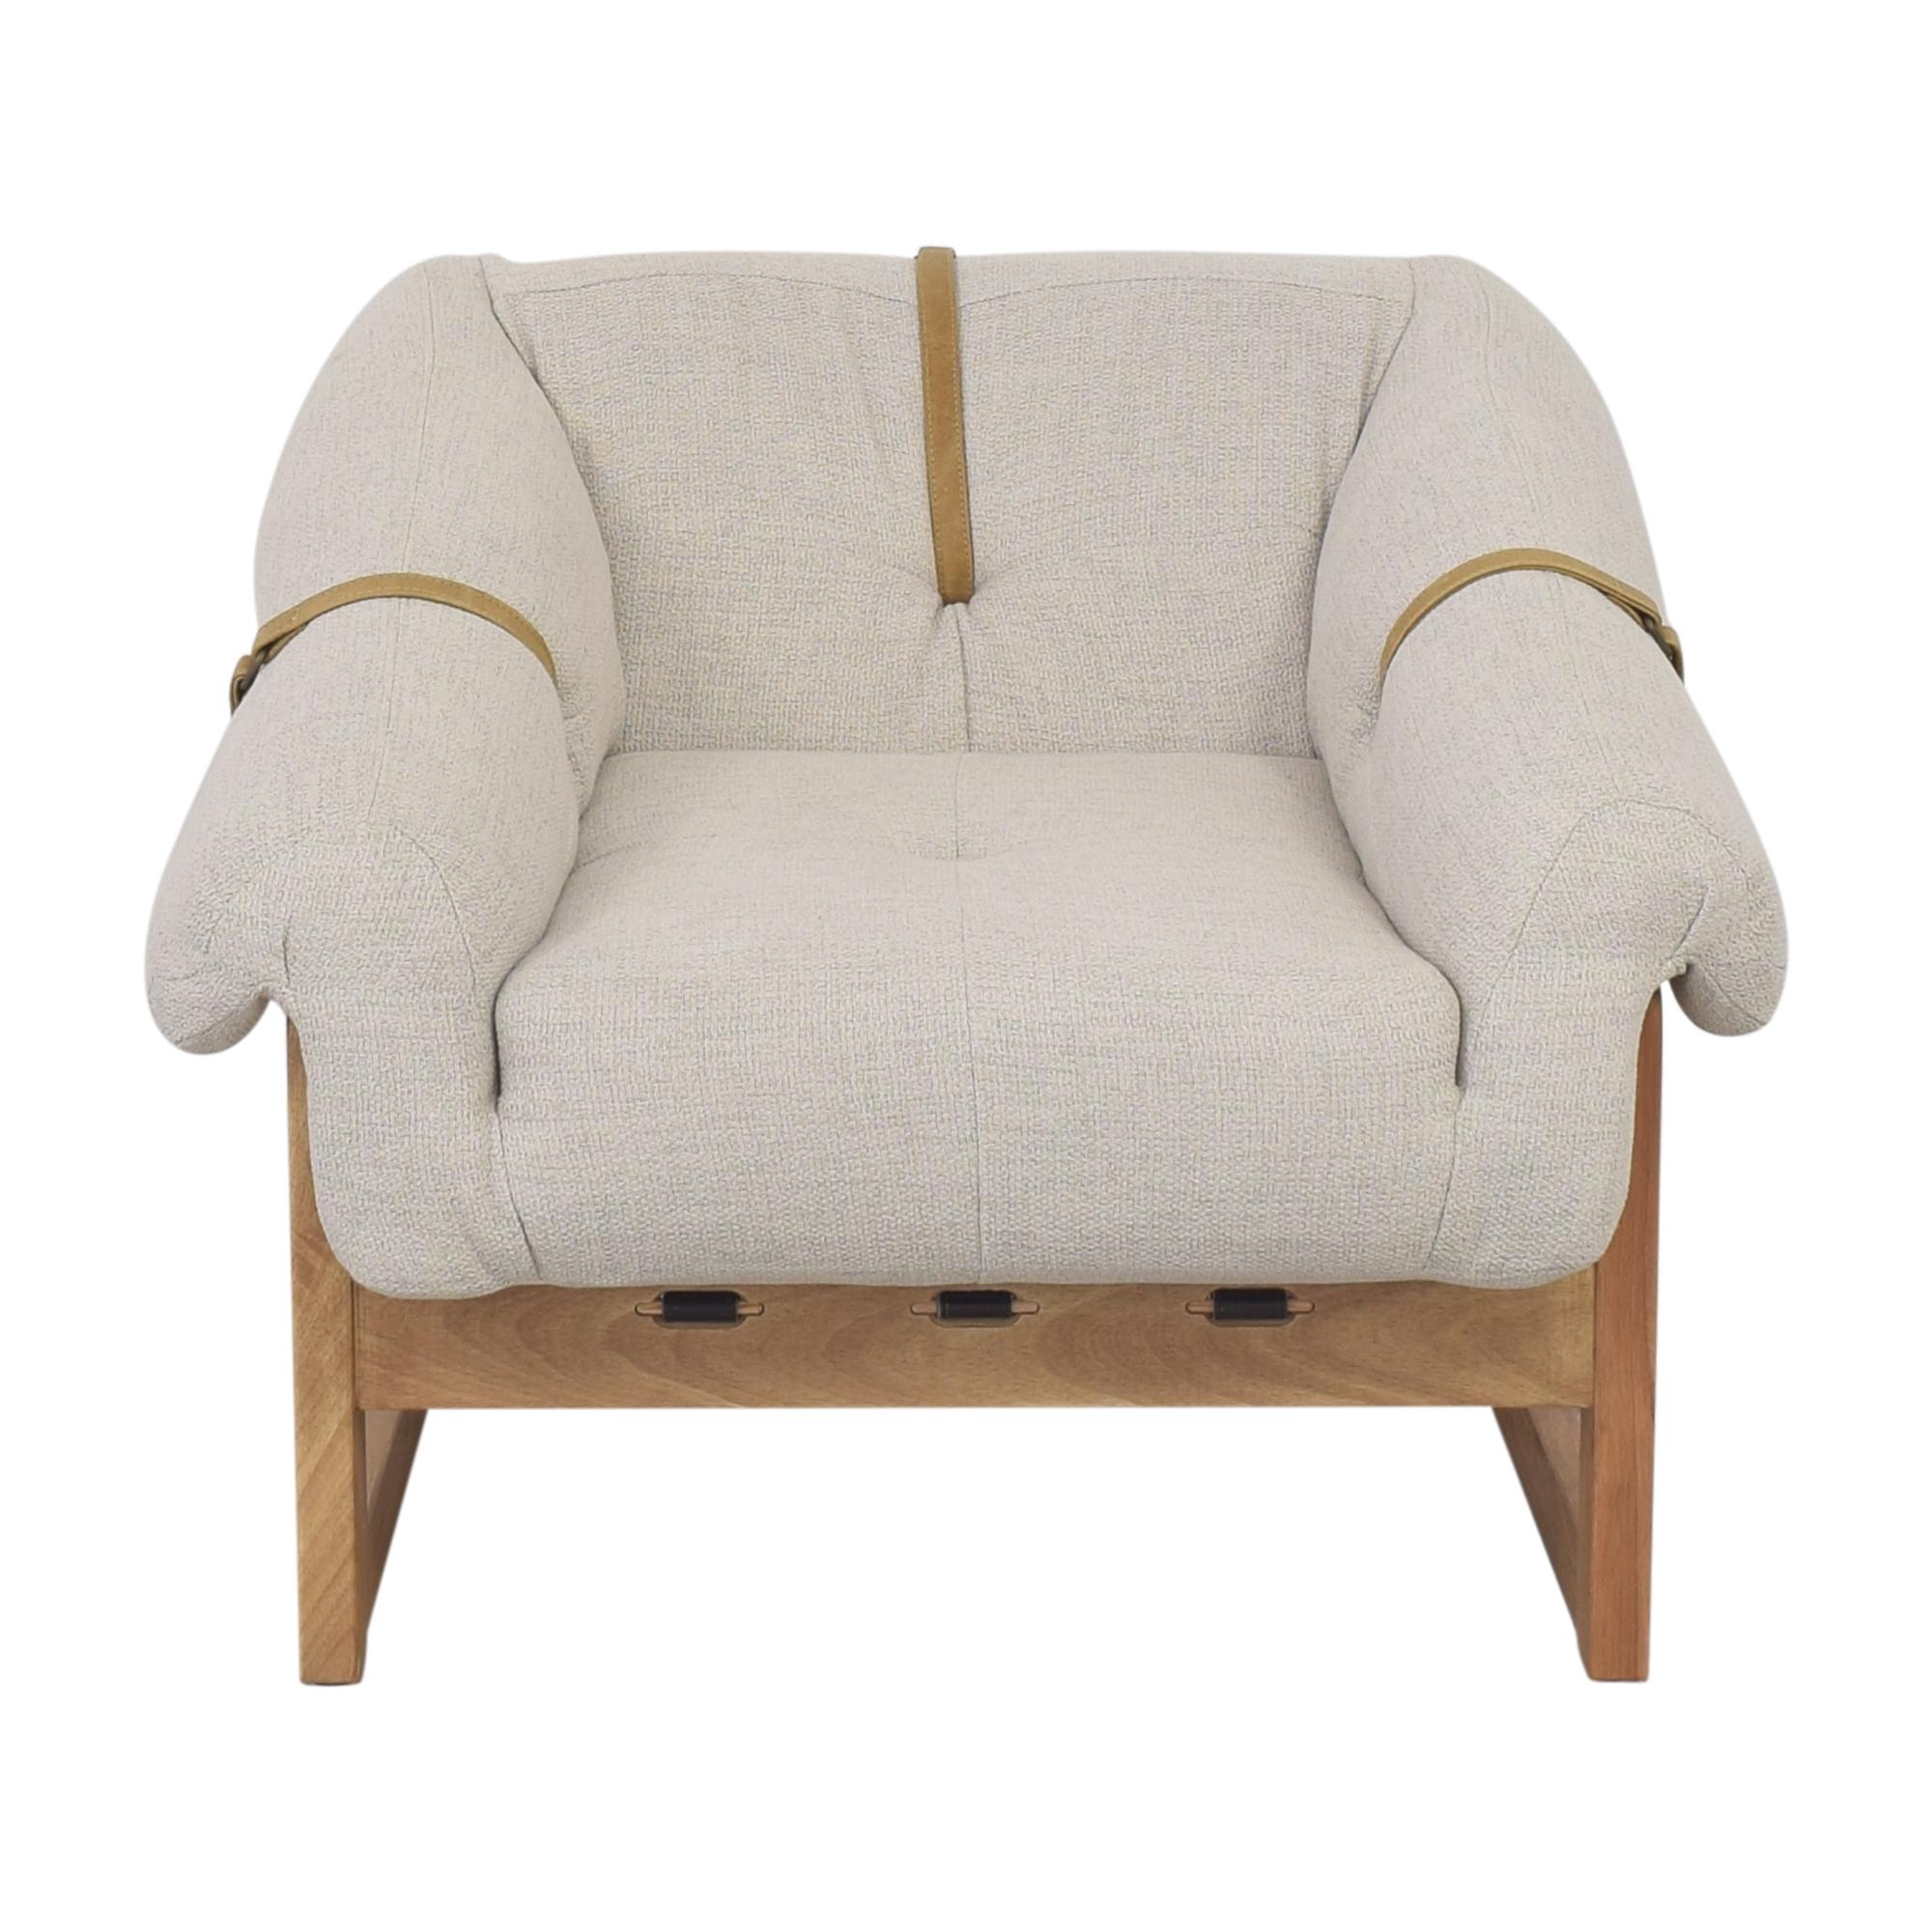 Industry West Industry West Larsen Lounge Chair discount